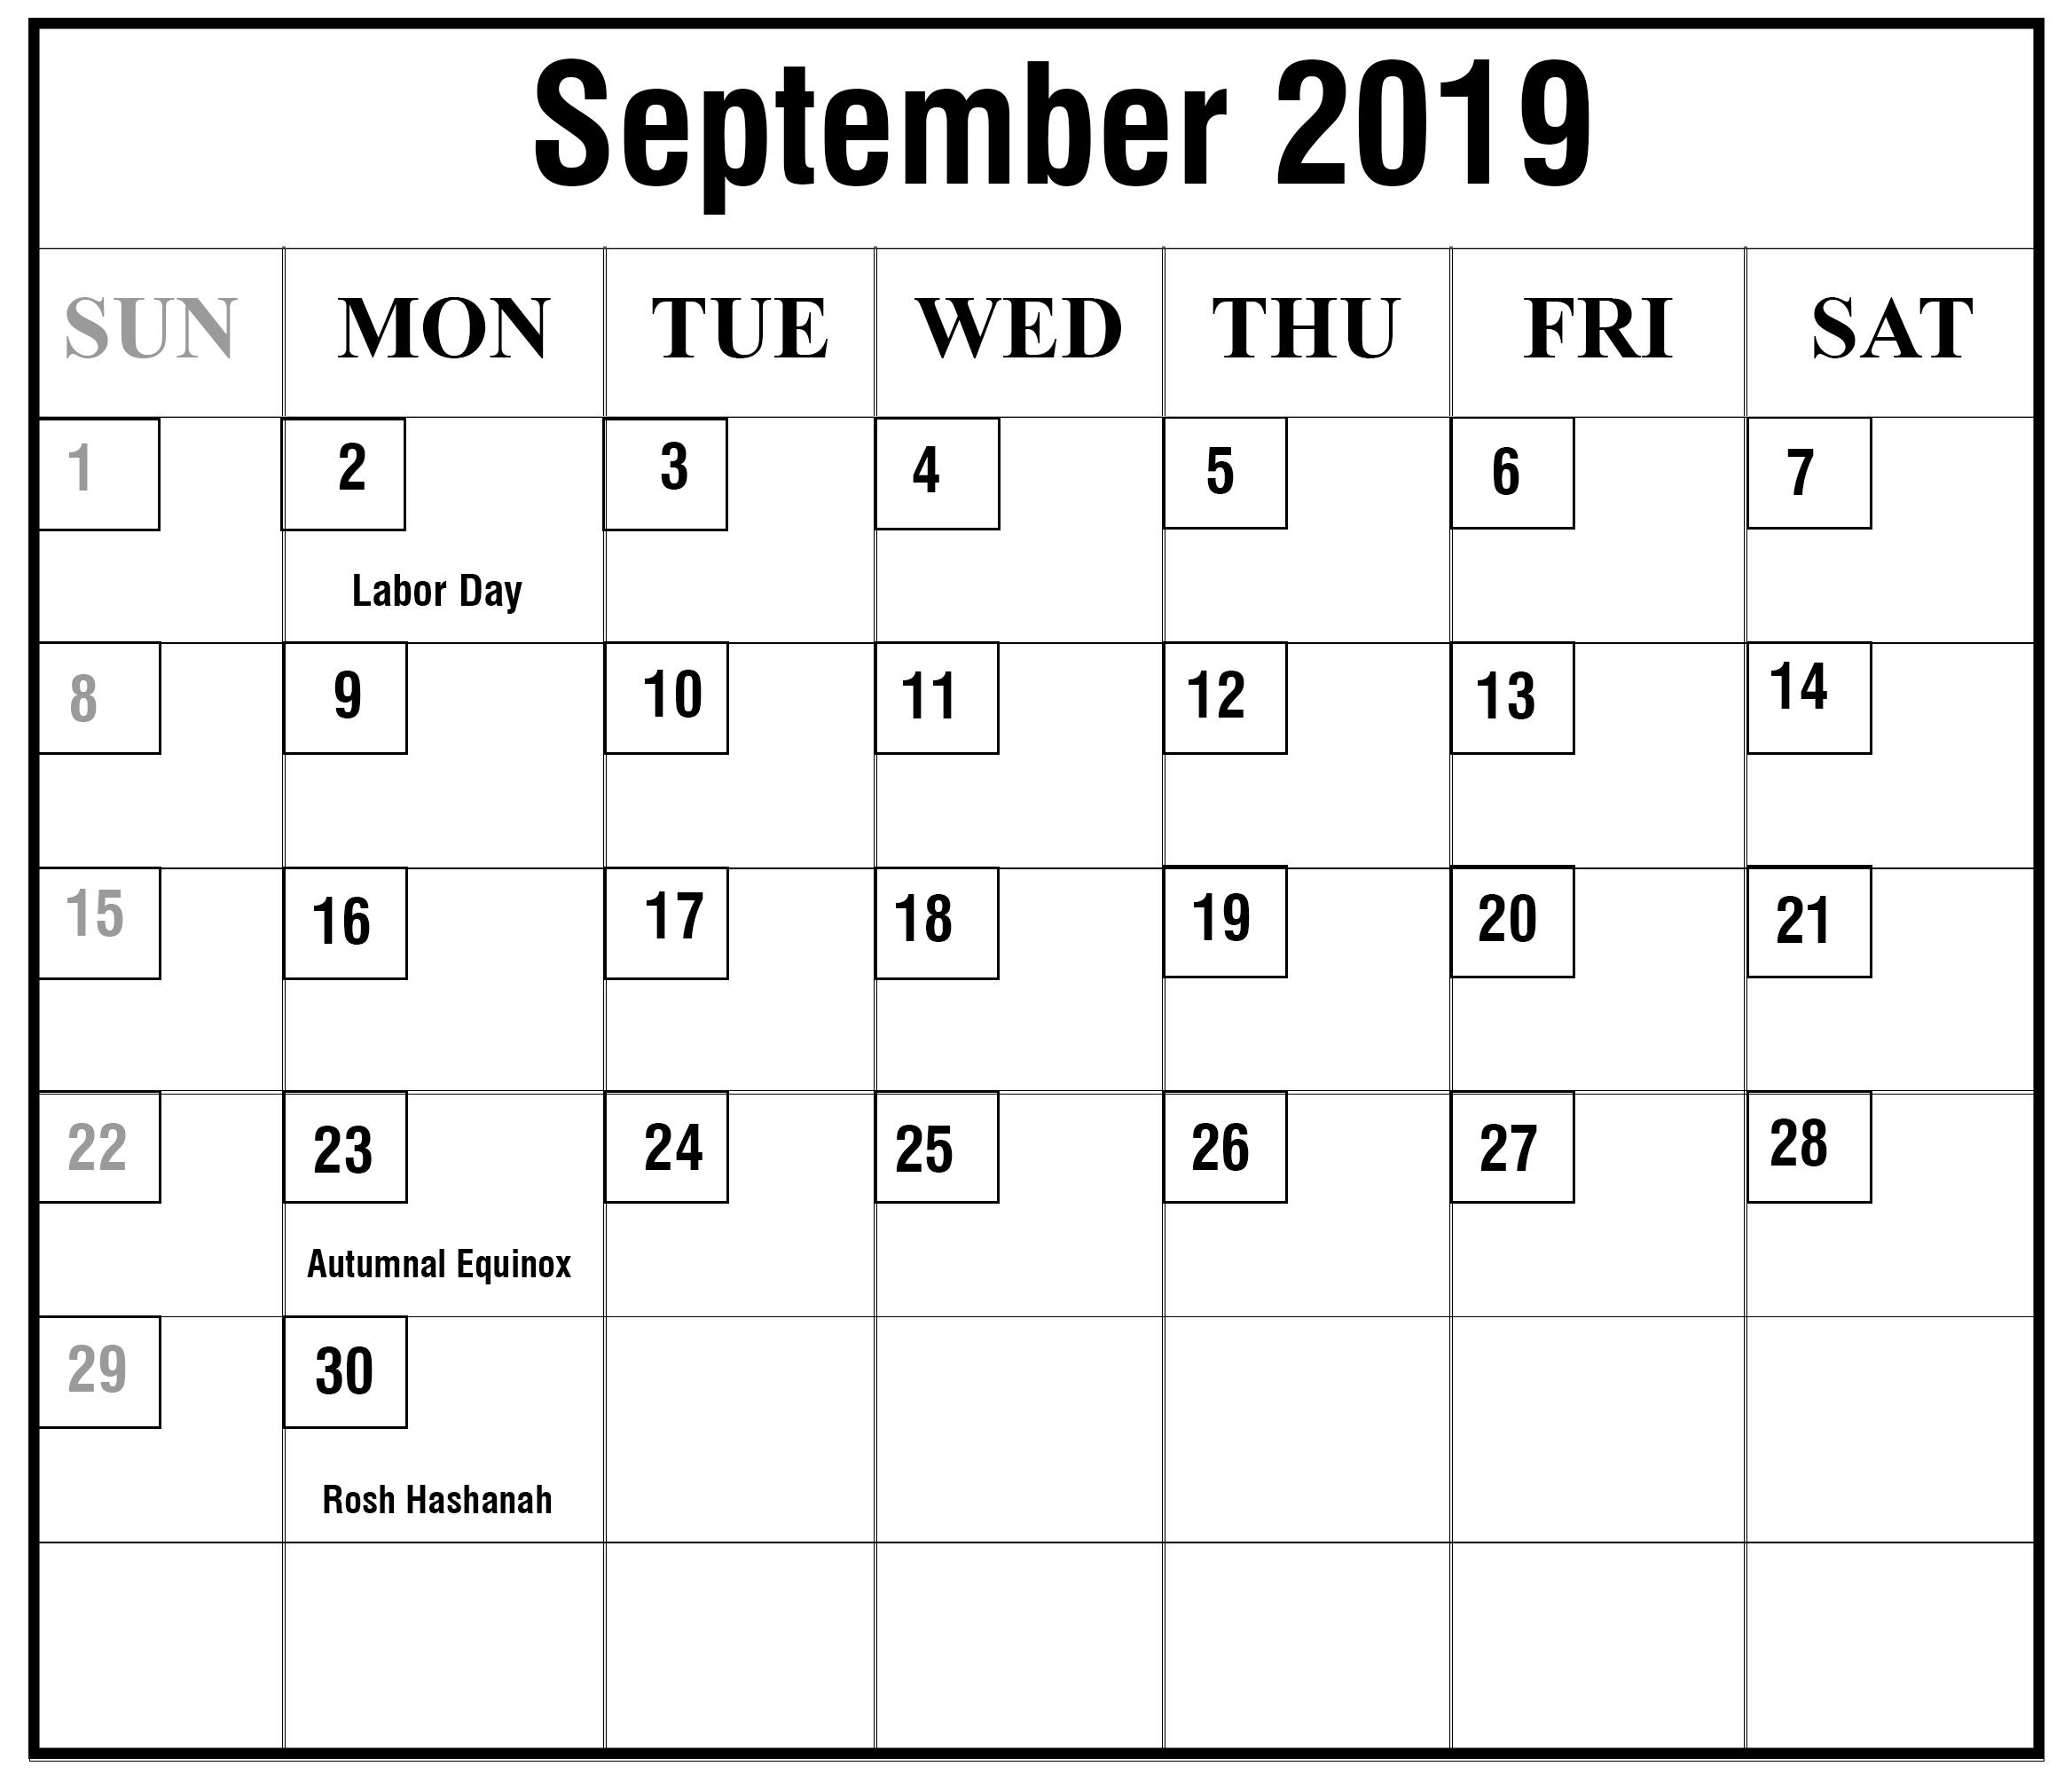 September 2019 Calendar with Holidays US